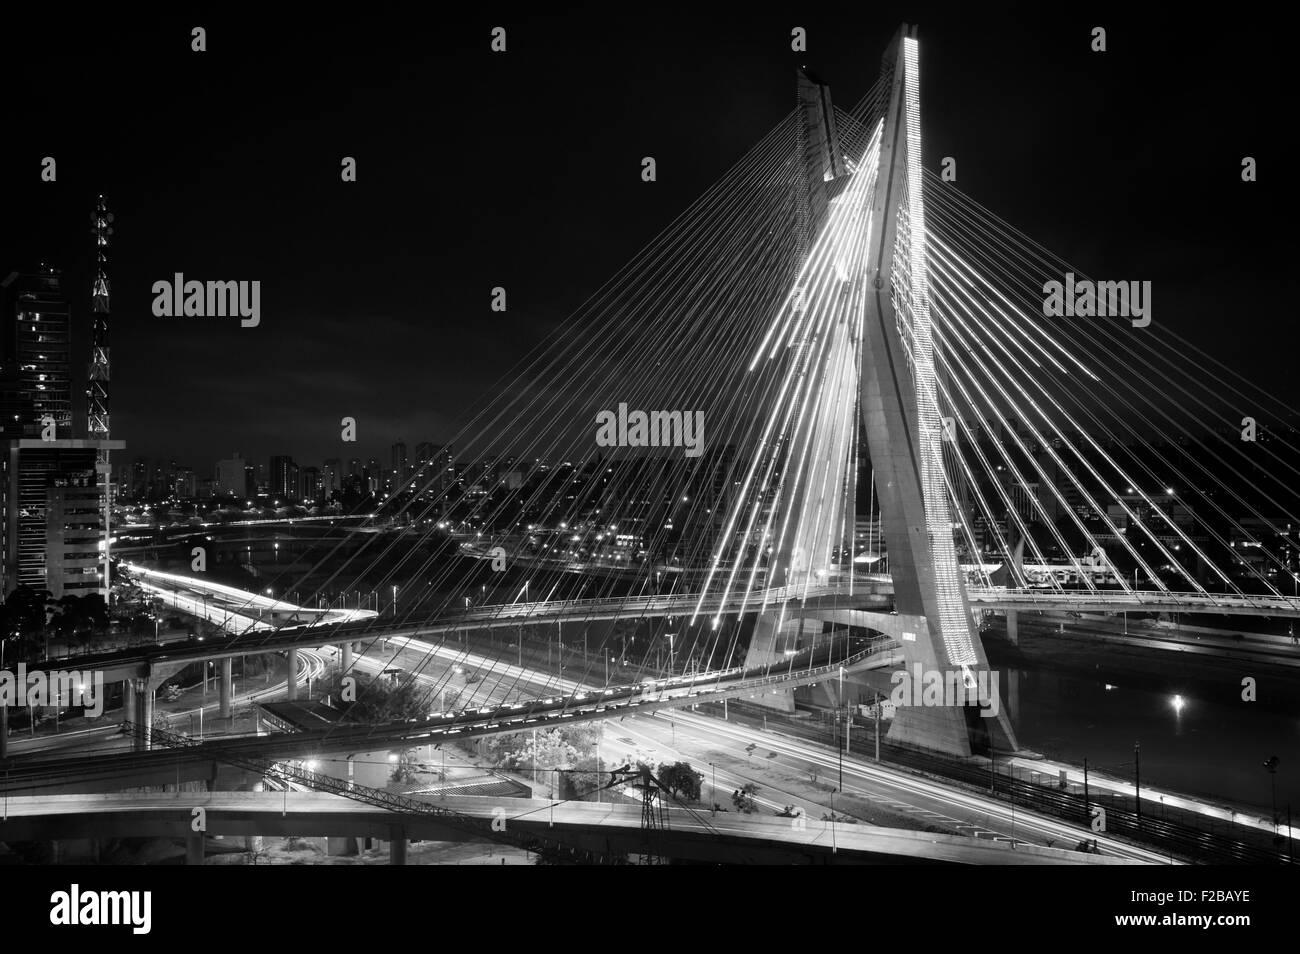 Most famous bridge lit up in the city at night, Octavio Frias De Oliveira Bridge, Pinheiros River, Sao Paulo, Brazil - Stock Image